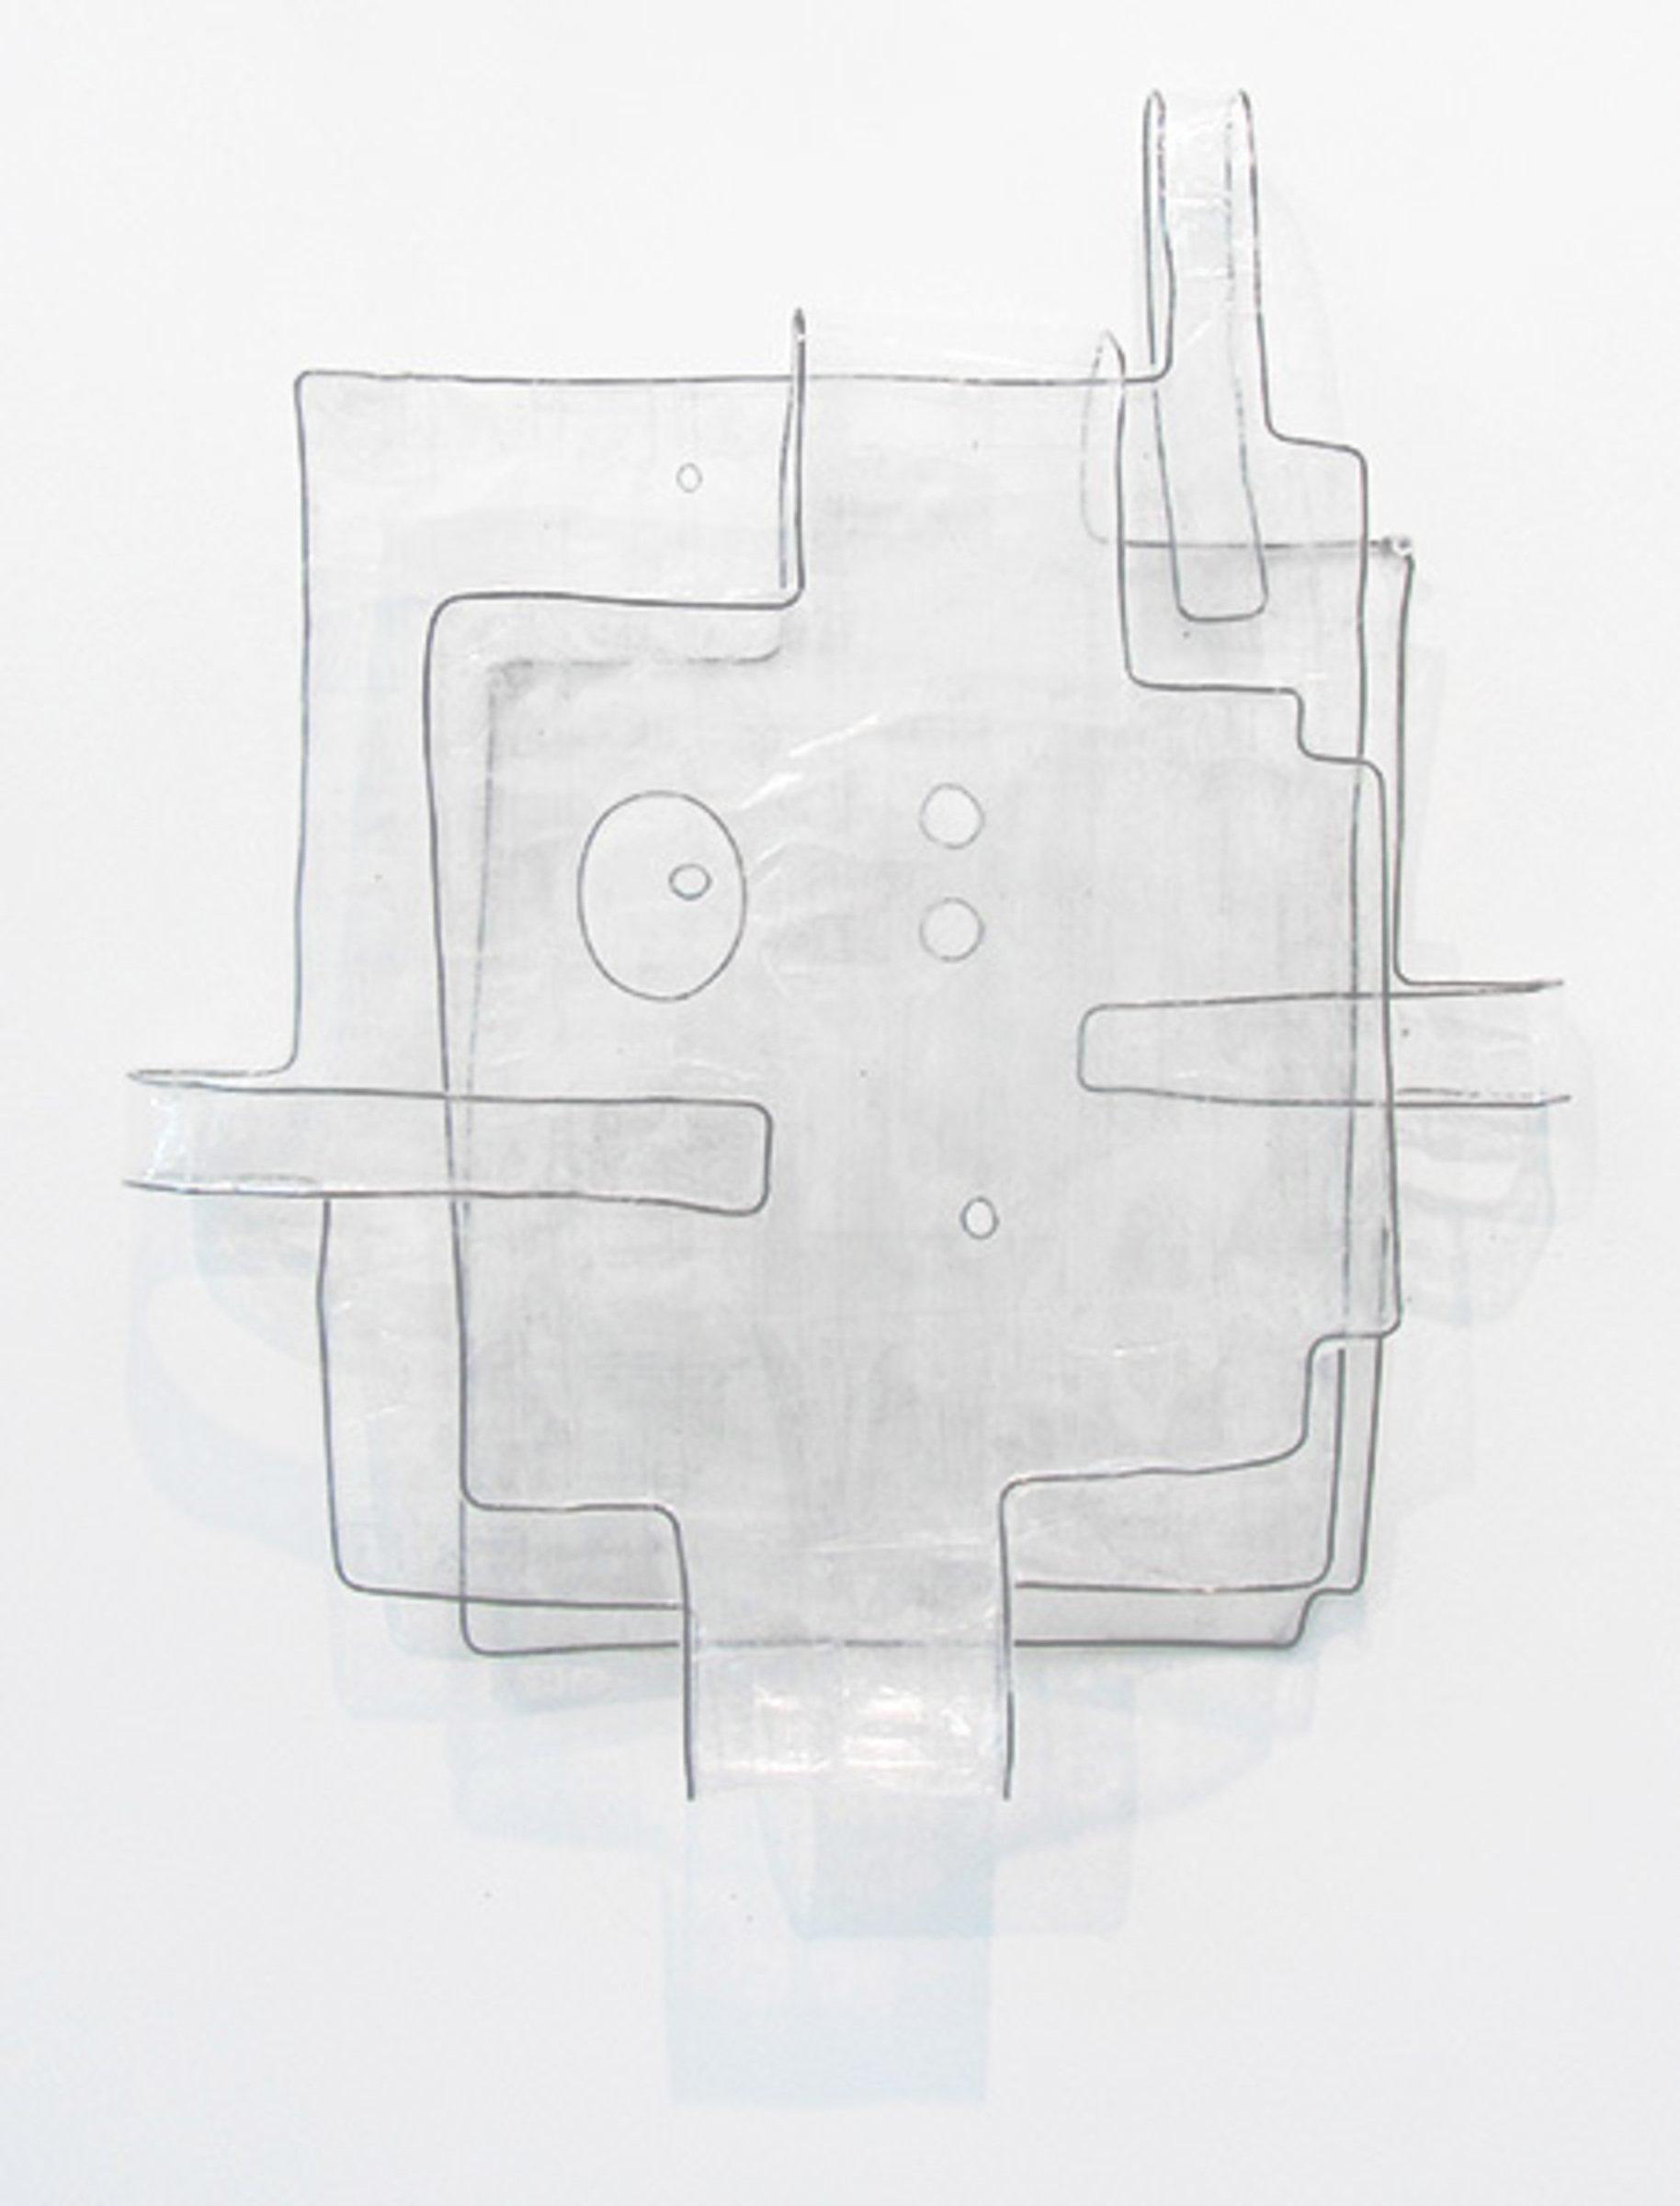 Robert Strati, Fold Up, 2015